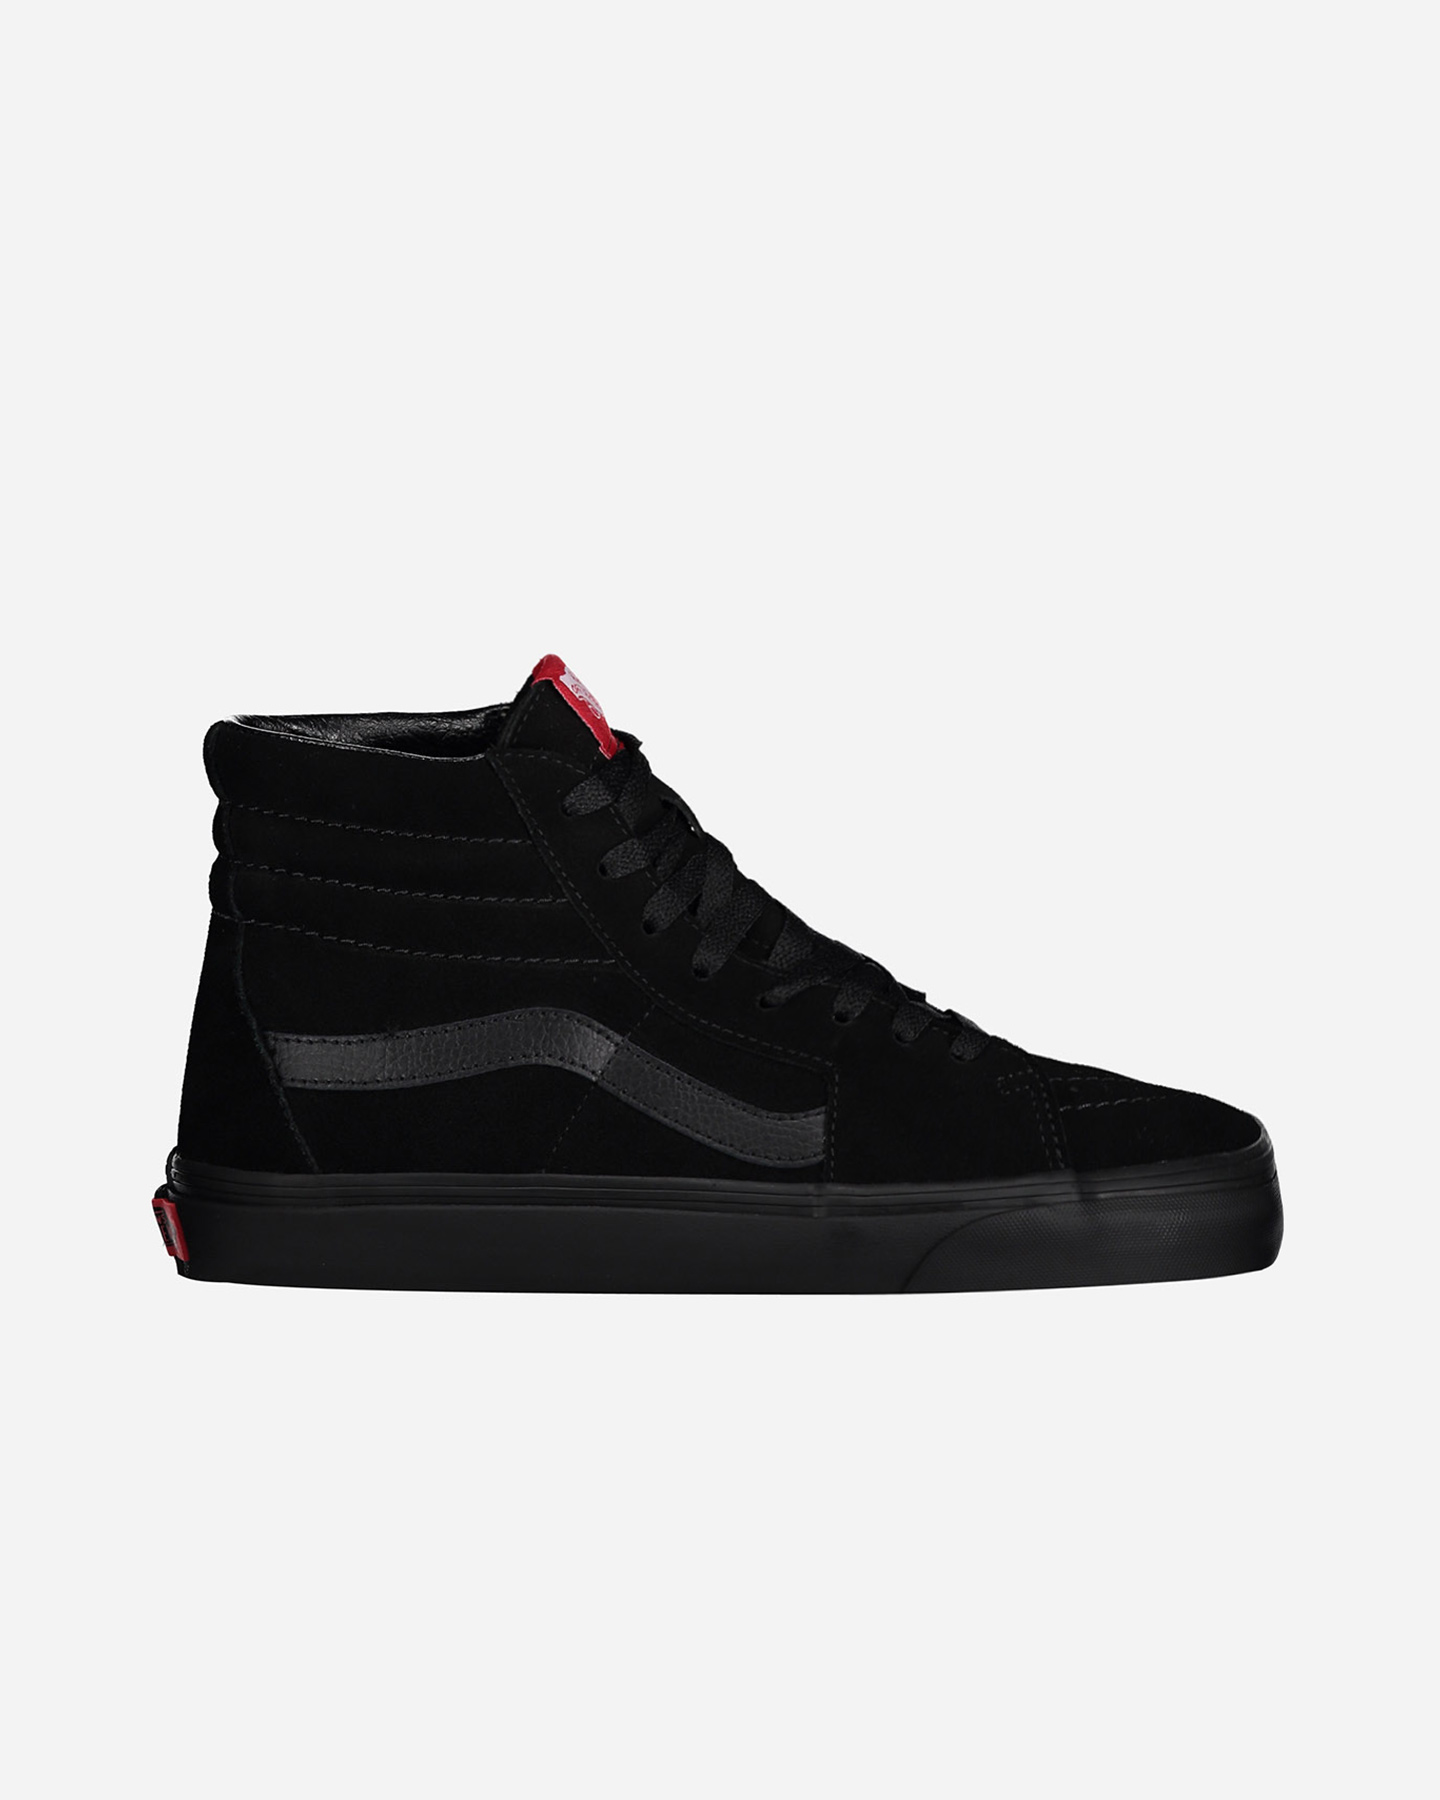 Su Cisalfa Vn000d5ibka1Scarpe Sport Sk8 Sneakers Vans Hi UMpSzV